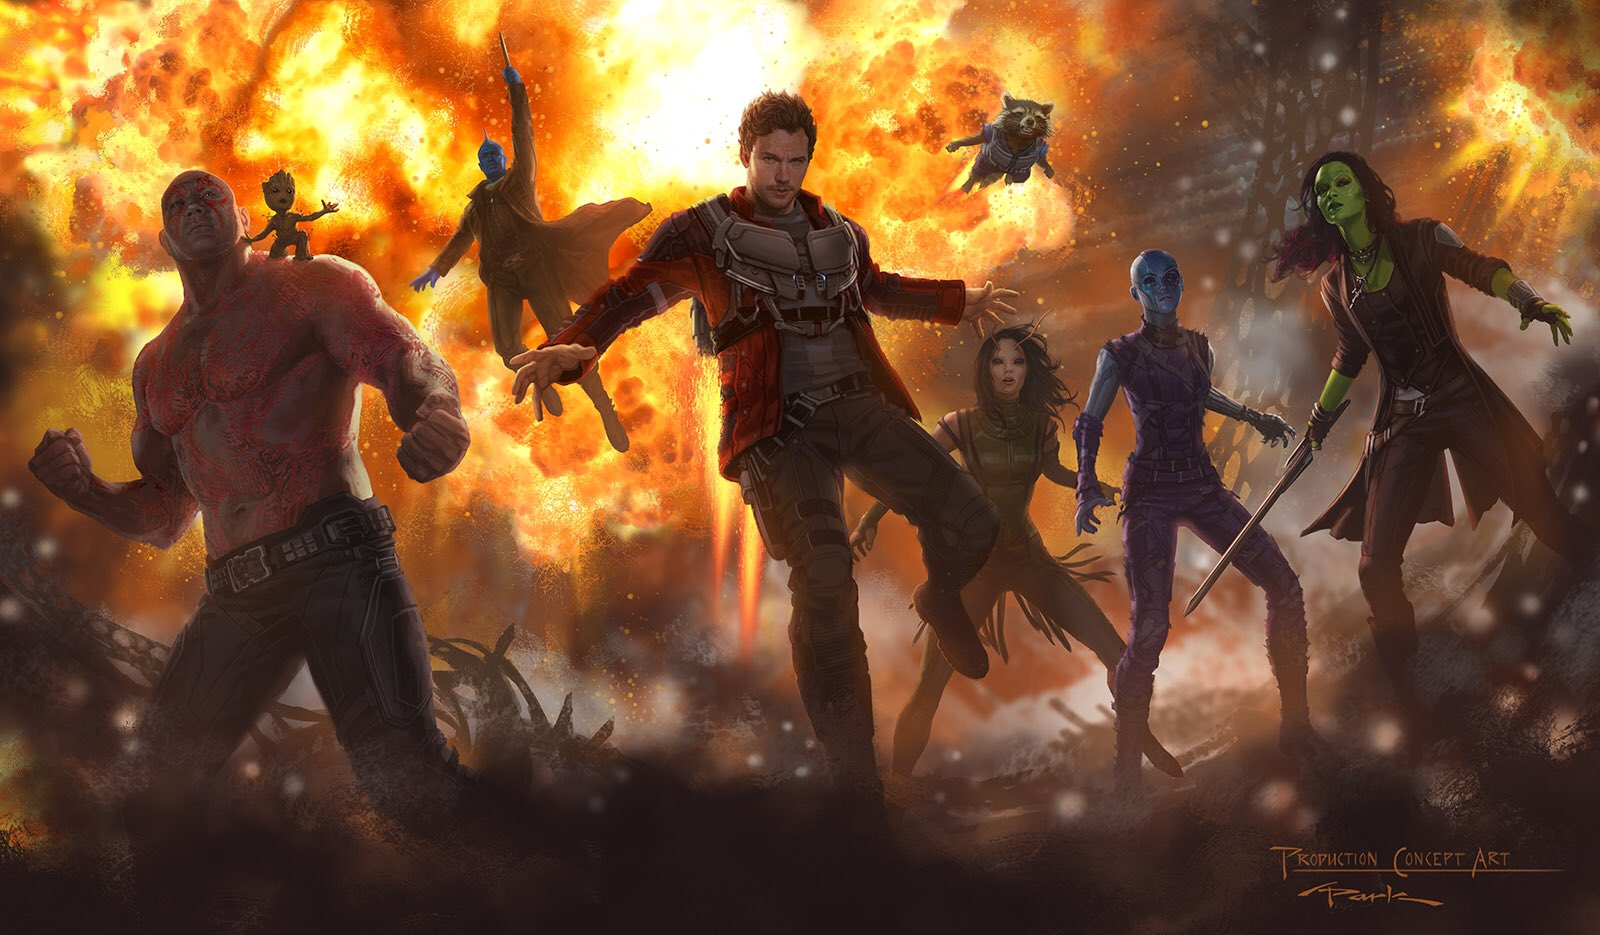 [En cartelera] Guardians of the Galaxy Vol. 2 CnYmHjHUkAACAzh